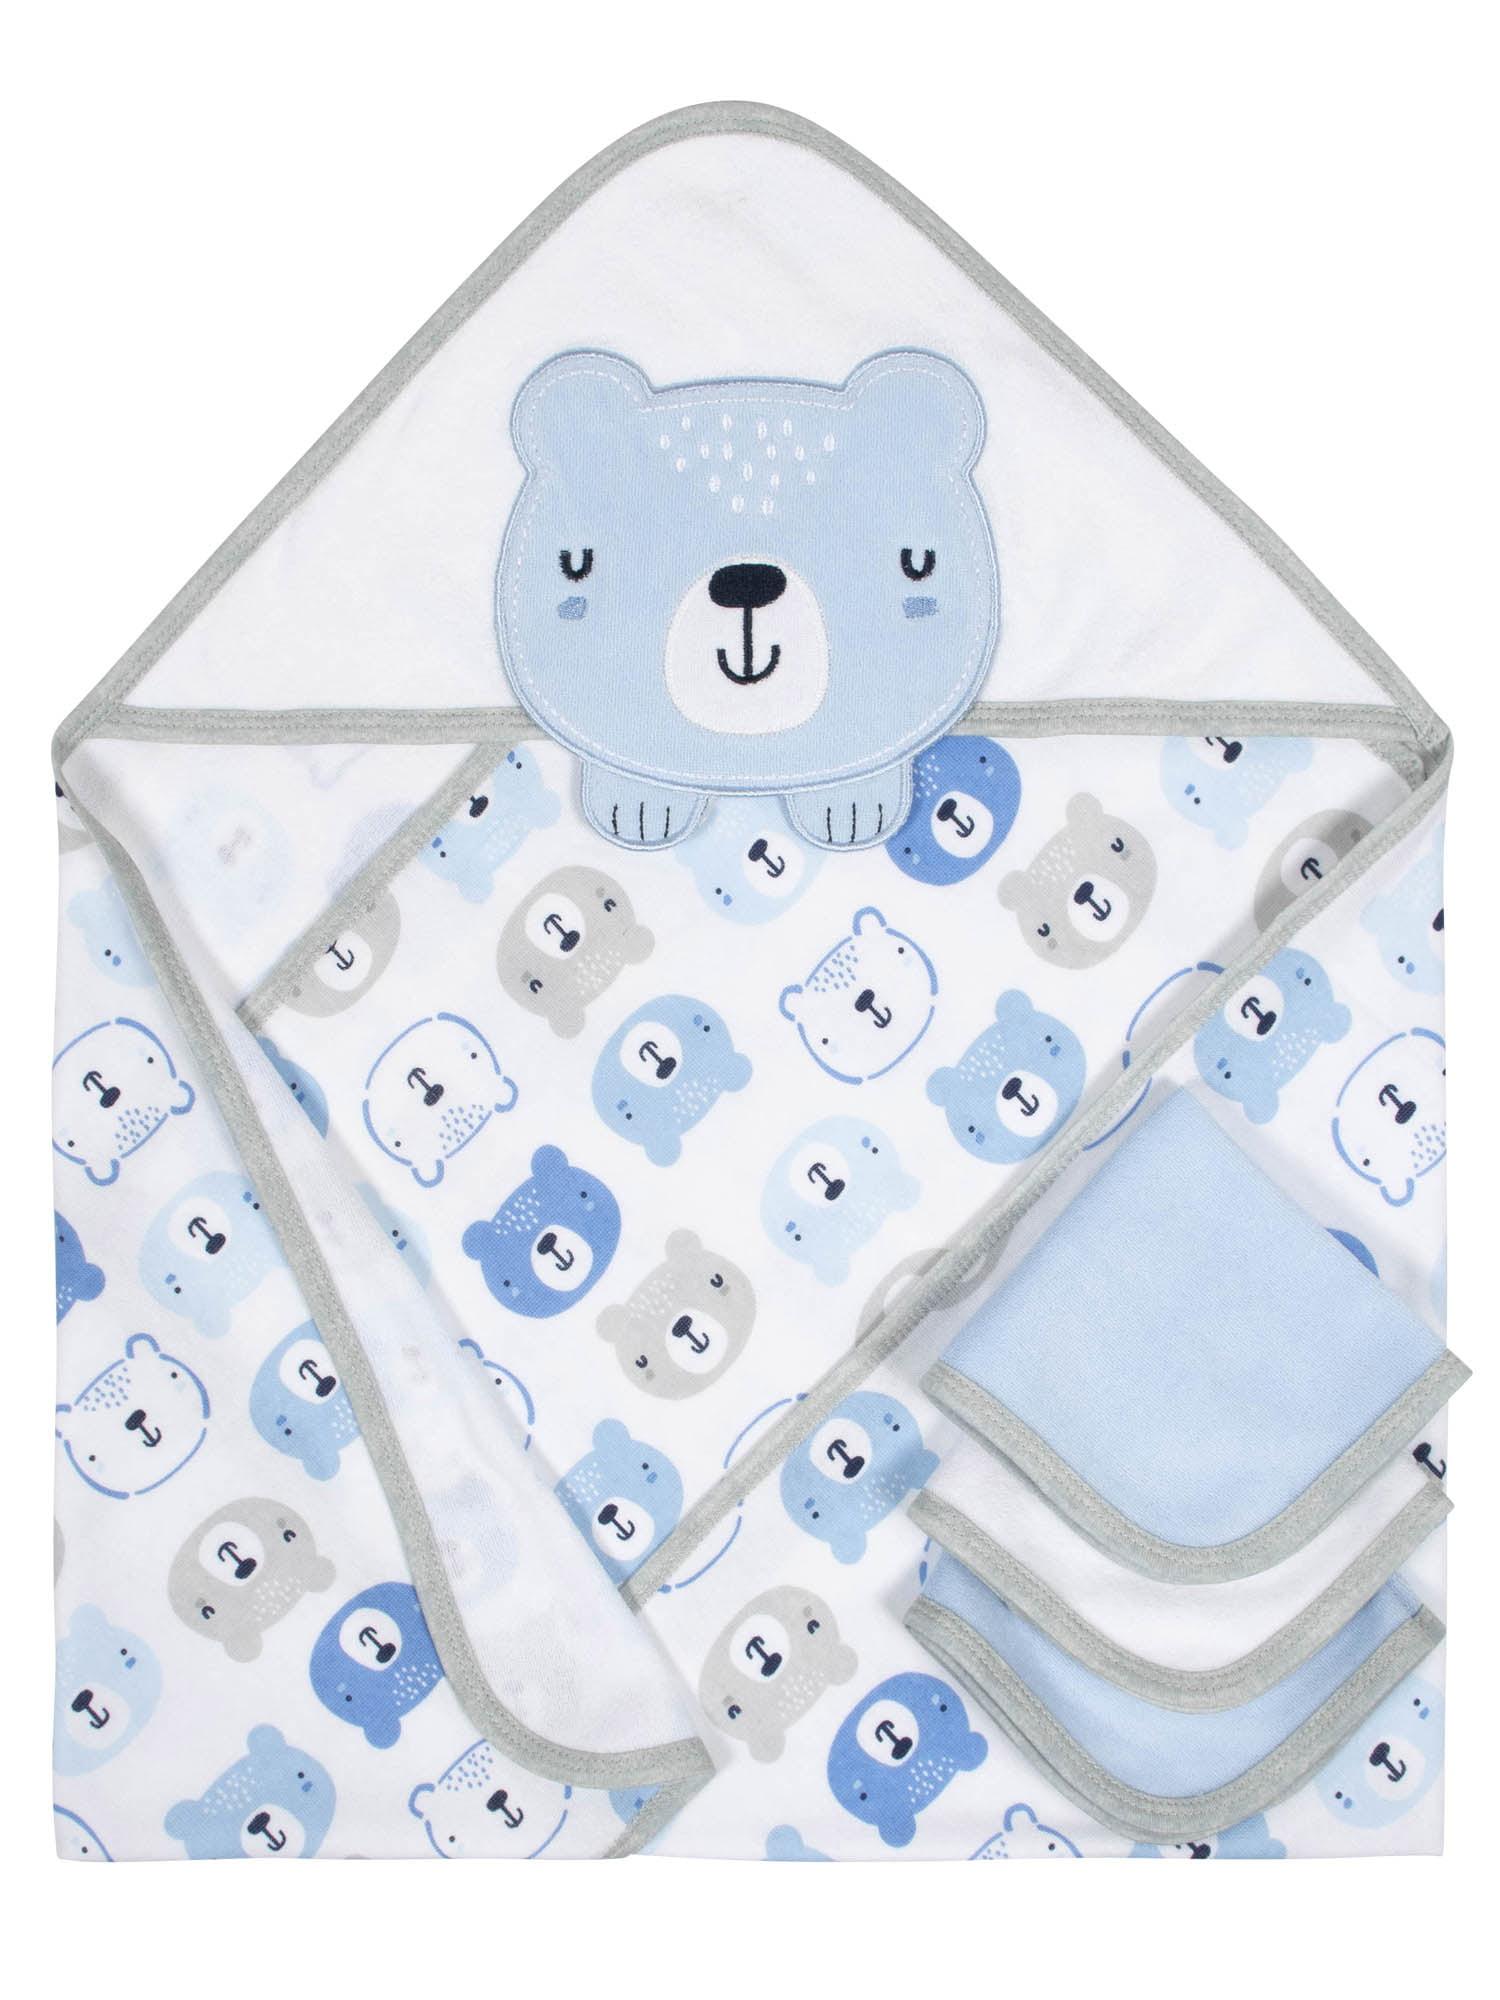 Gerber Organic Cotton Hooded Towel and Washcloths Bath Set, 4pc (Baby Boy)